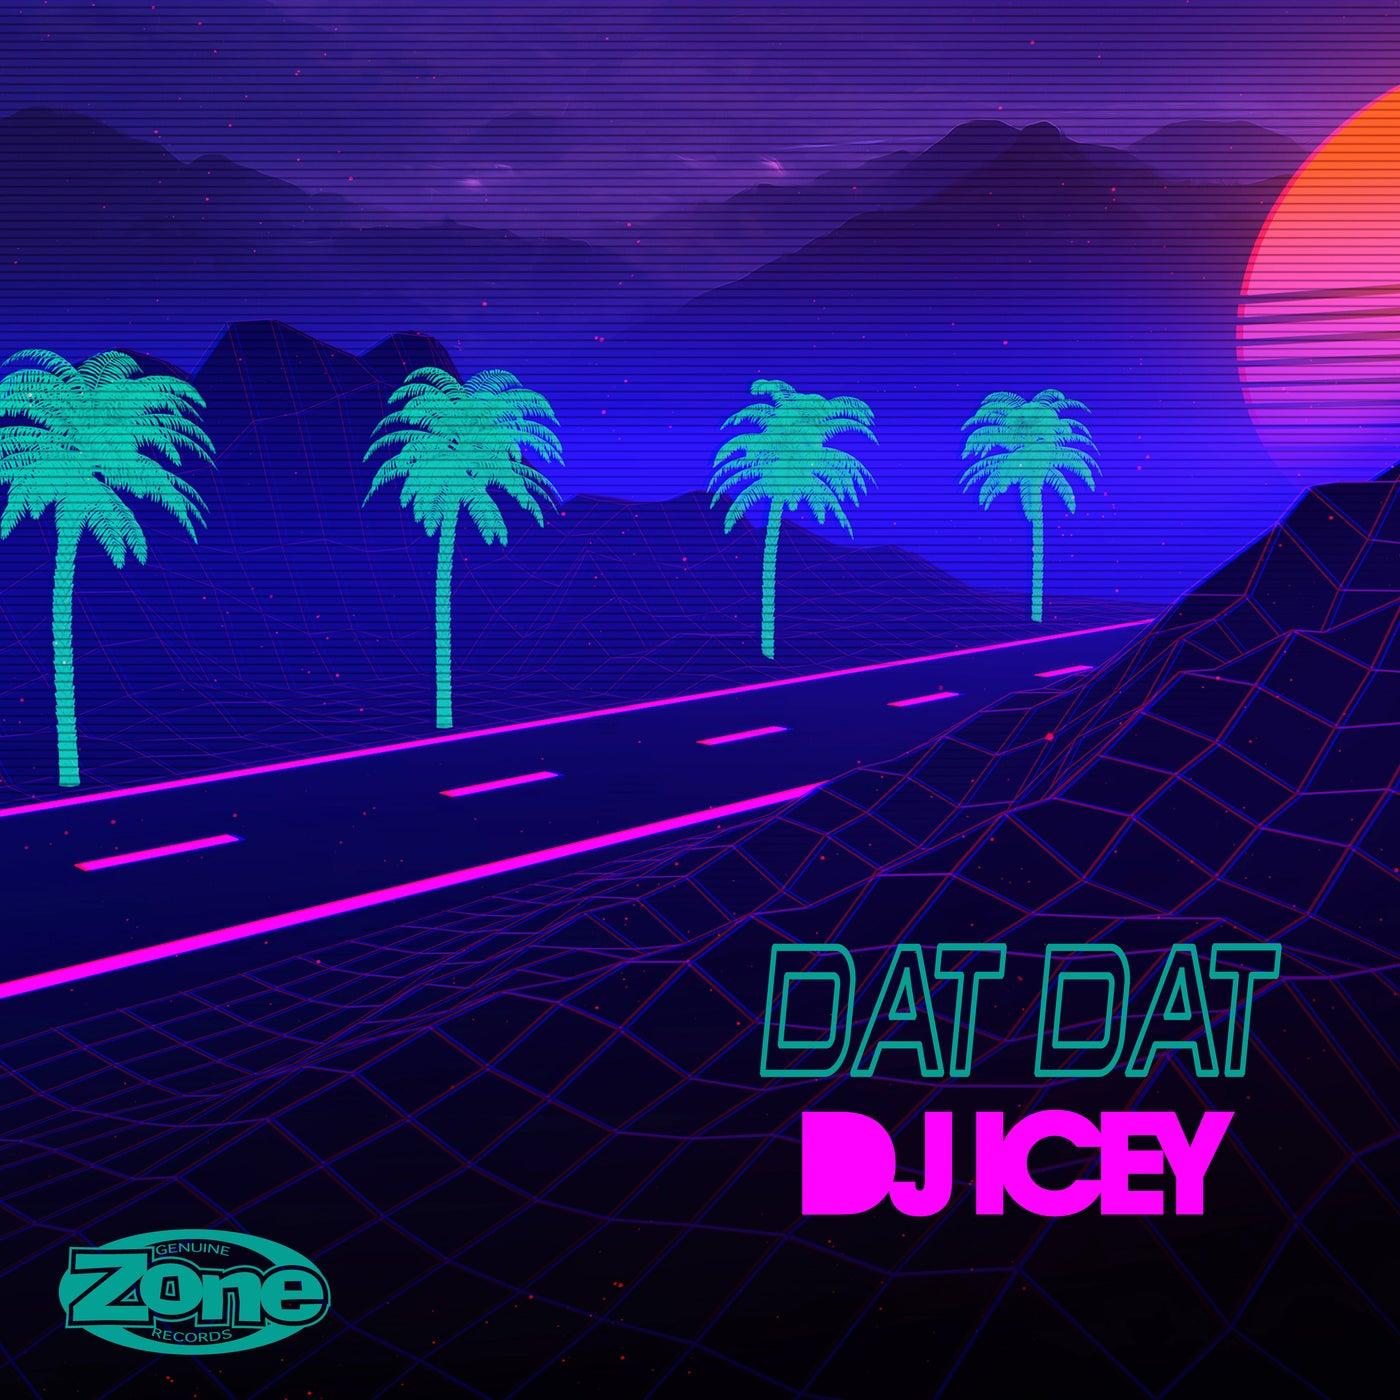 DAT DAT (Original Mix)